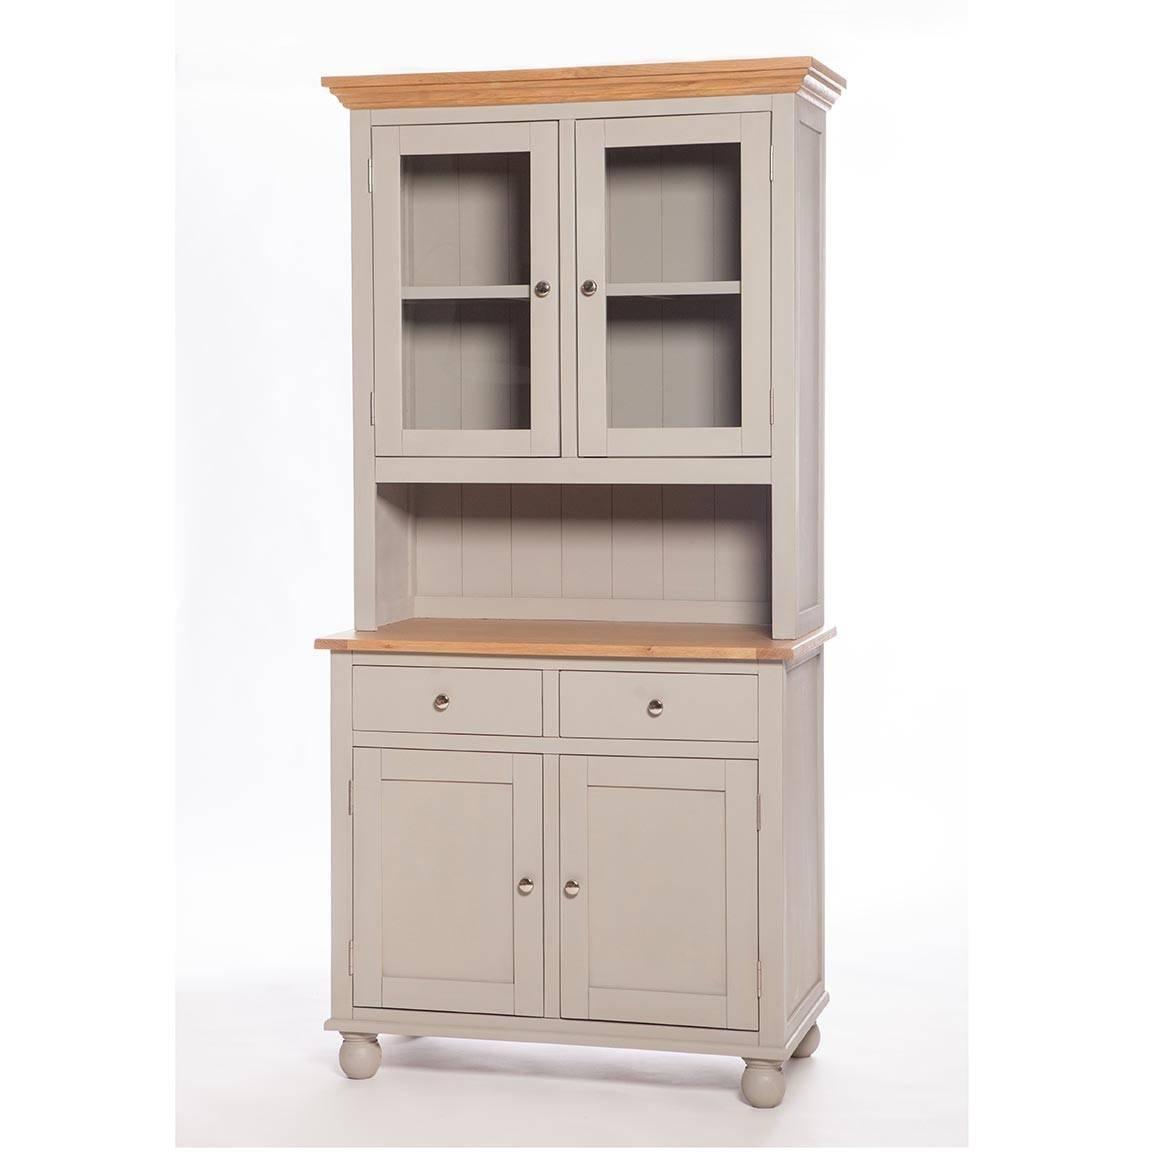 Somerset Small Kitchen Dresser | Woodlands Furniture Inside Narrow Kitchen Sideboards (View 8 of 15)